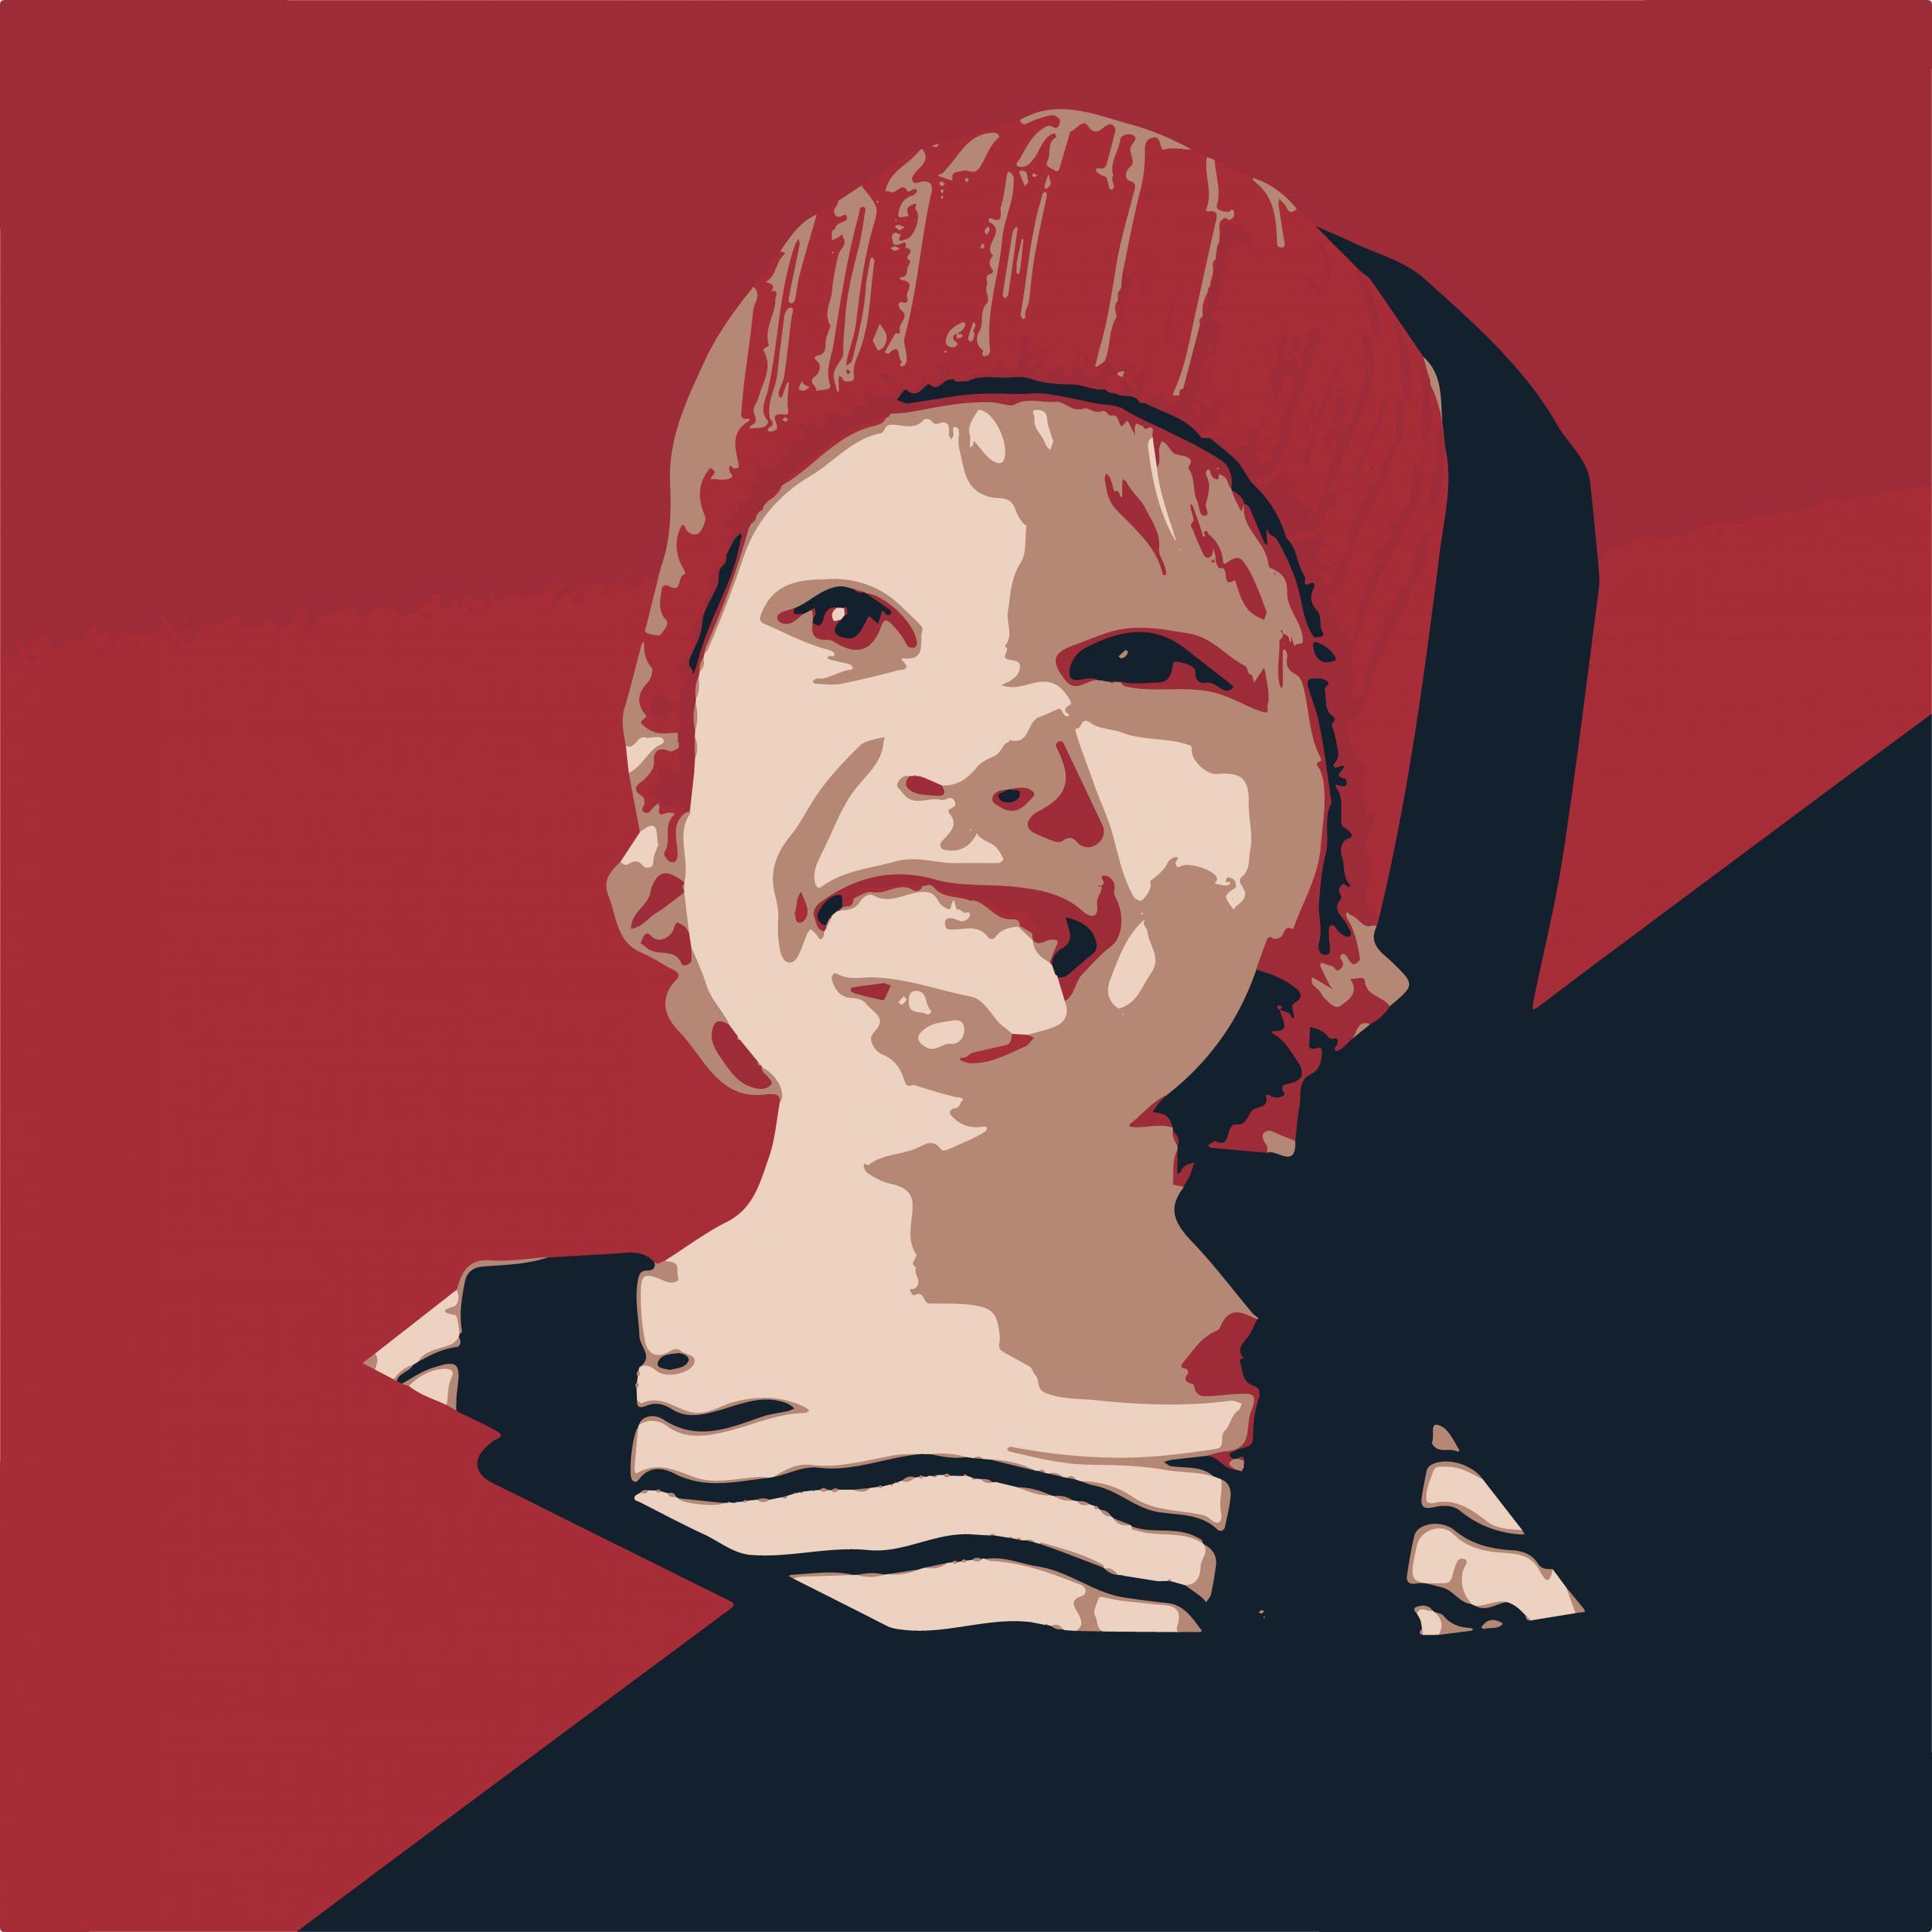 Illustration of a child